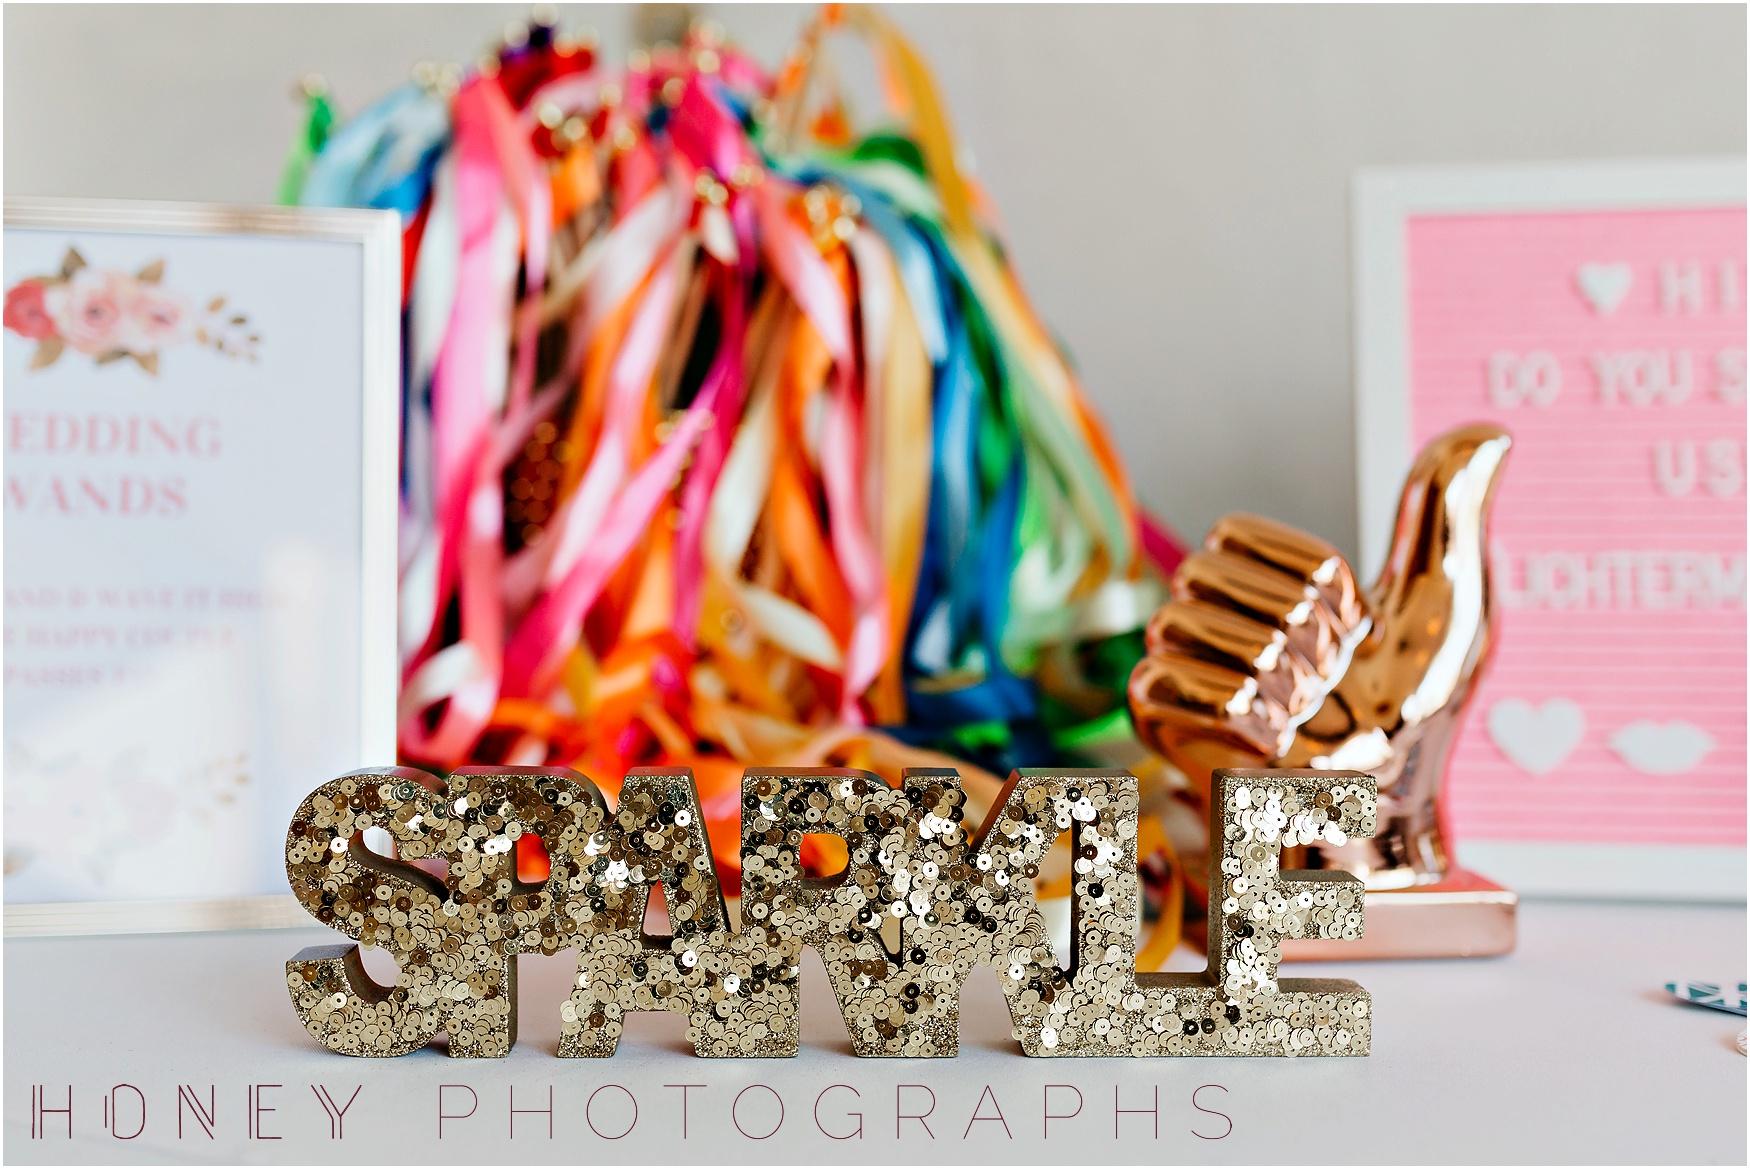 colorful_ecclectic_vibrant_vista_rainbow_quirky_wedding013.jpg